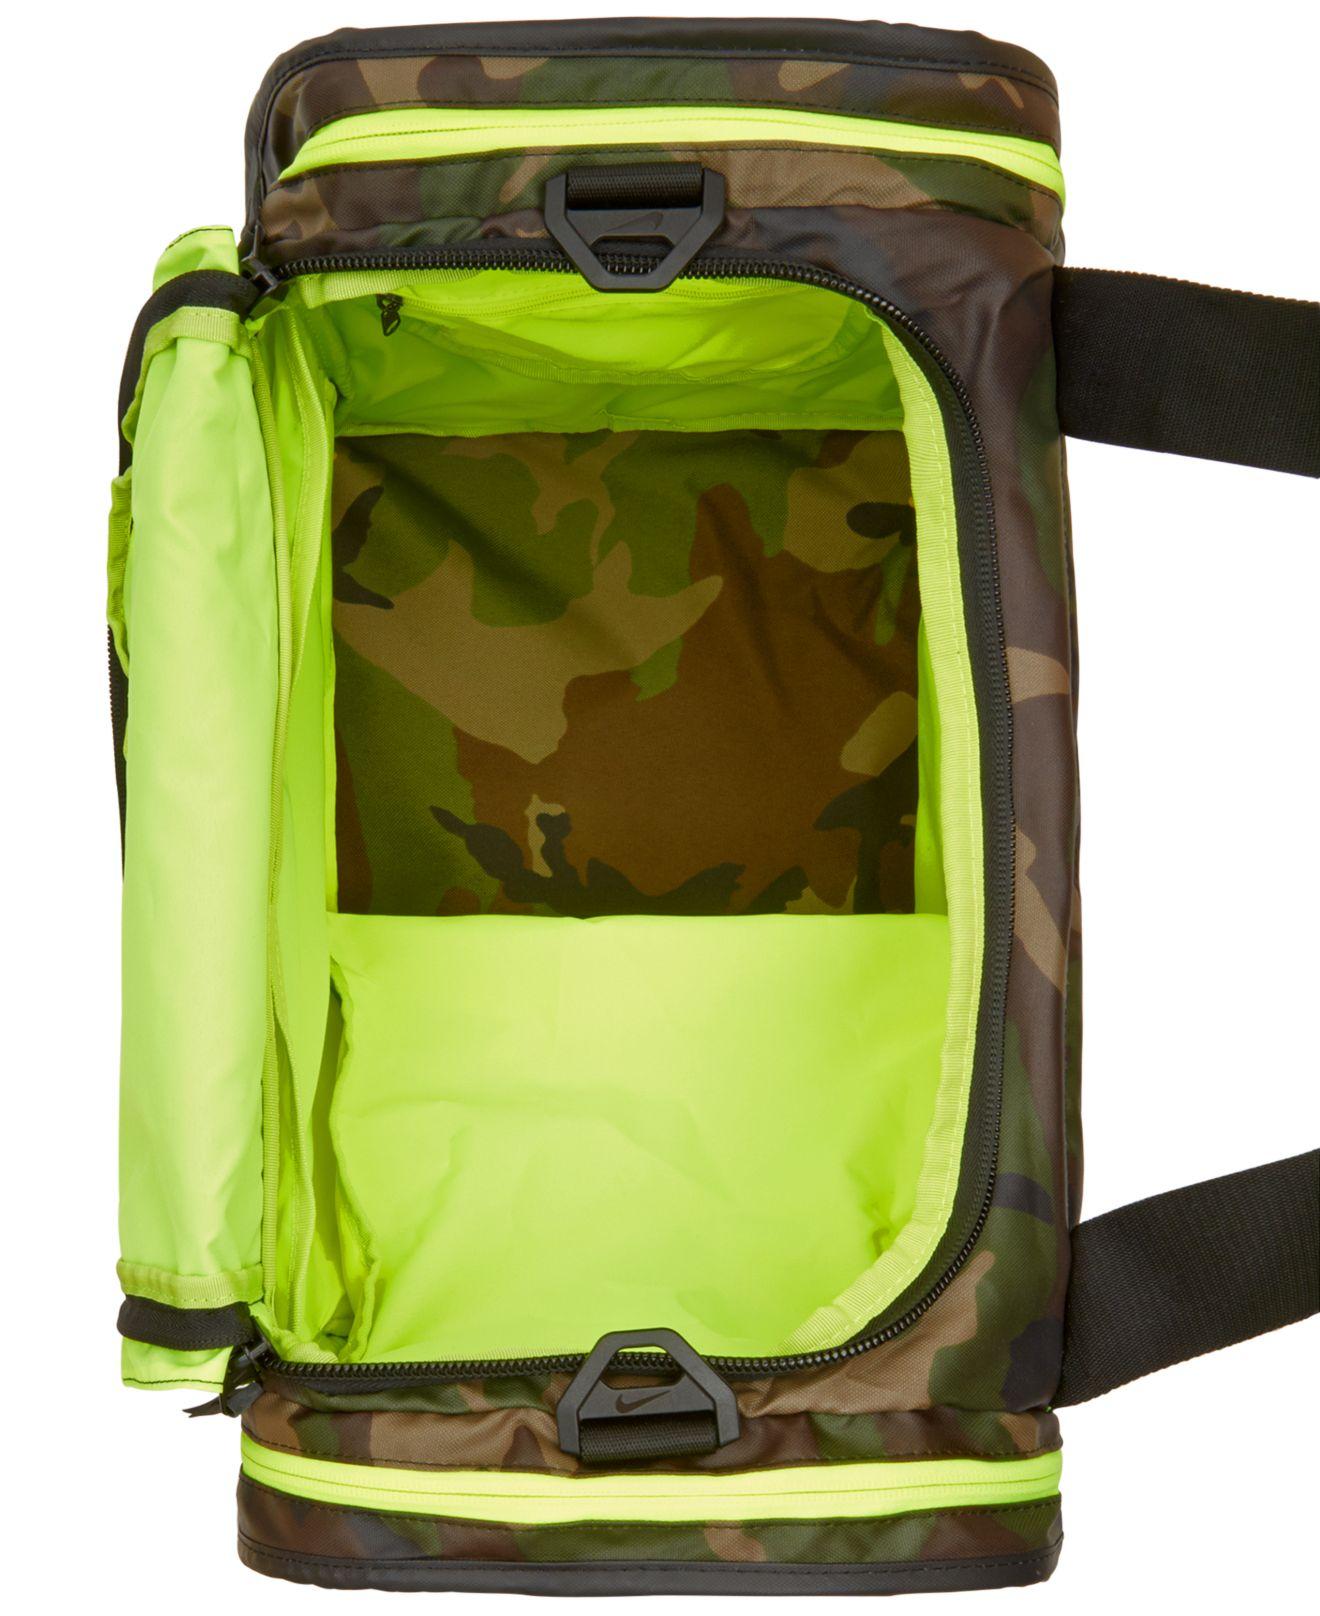 Lyst - Nike Ultimatum Small Duffel Bag in Black for Men cd71d26a287dc